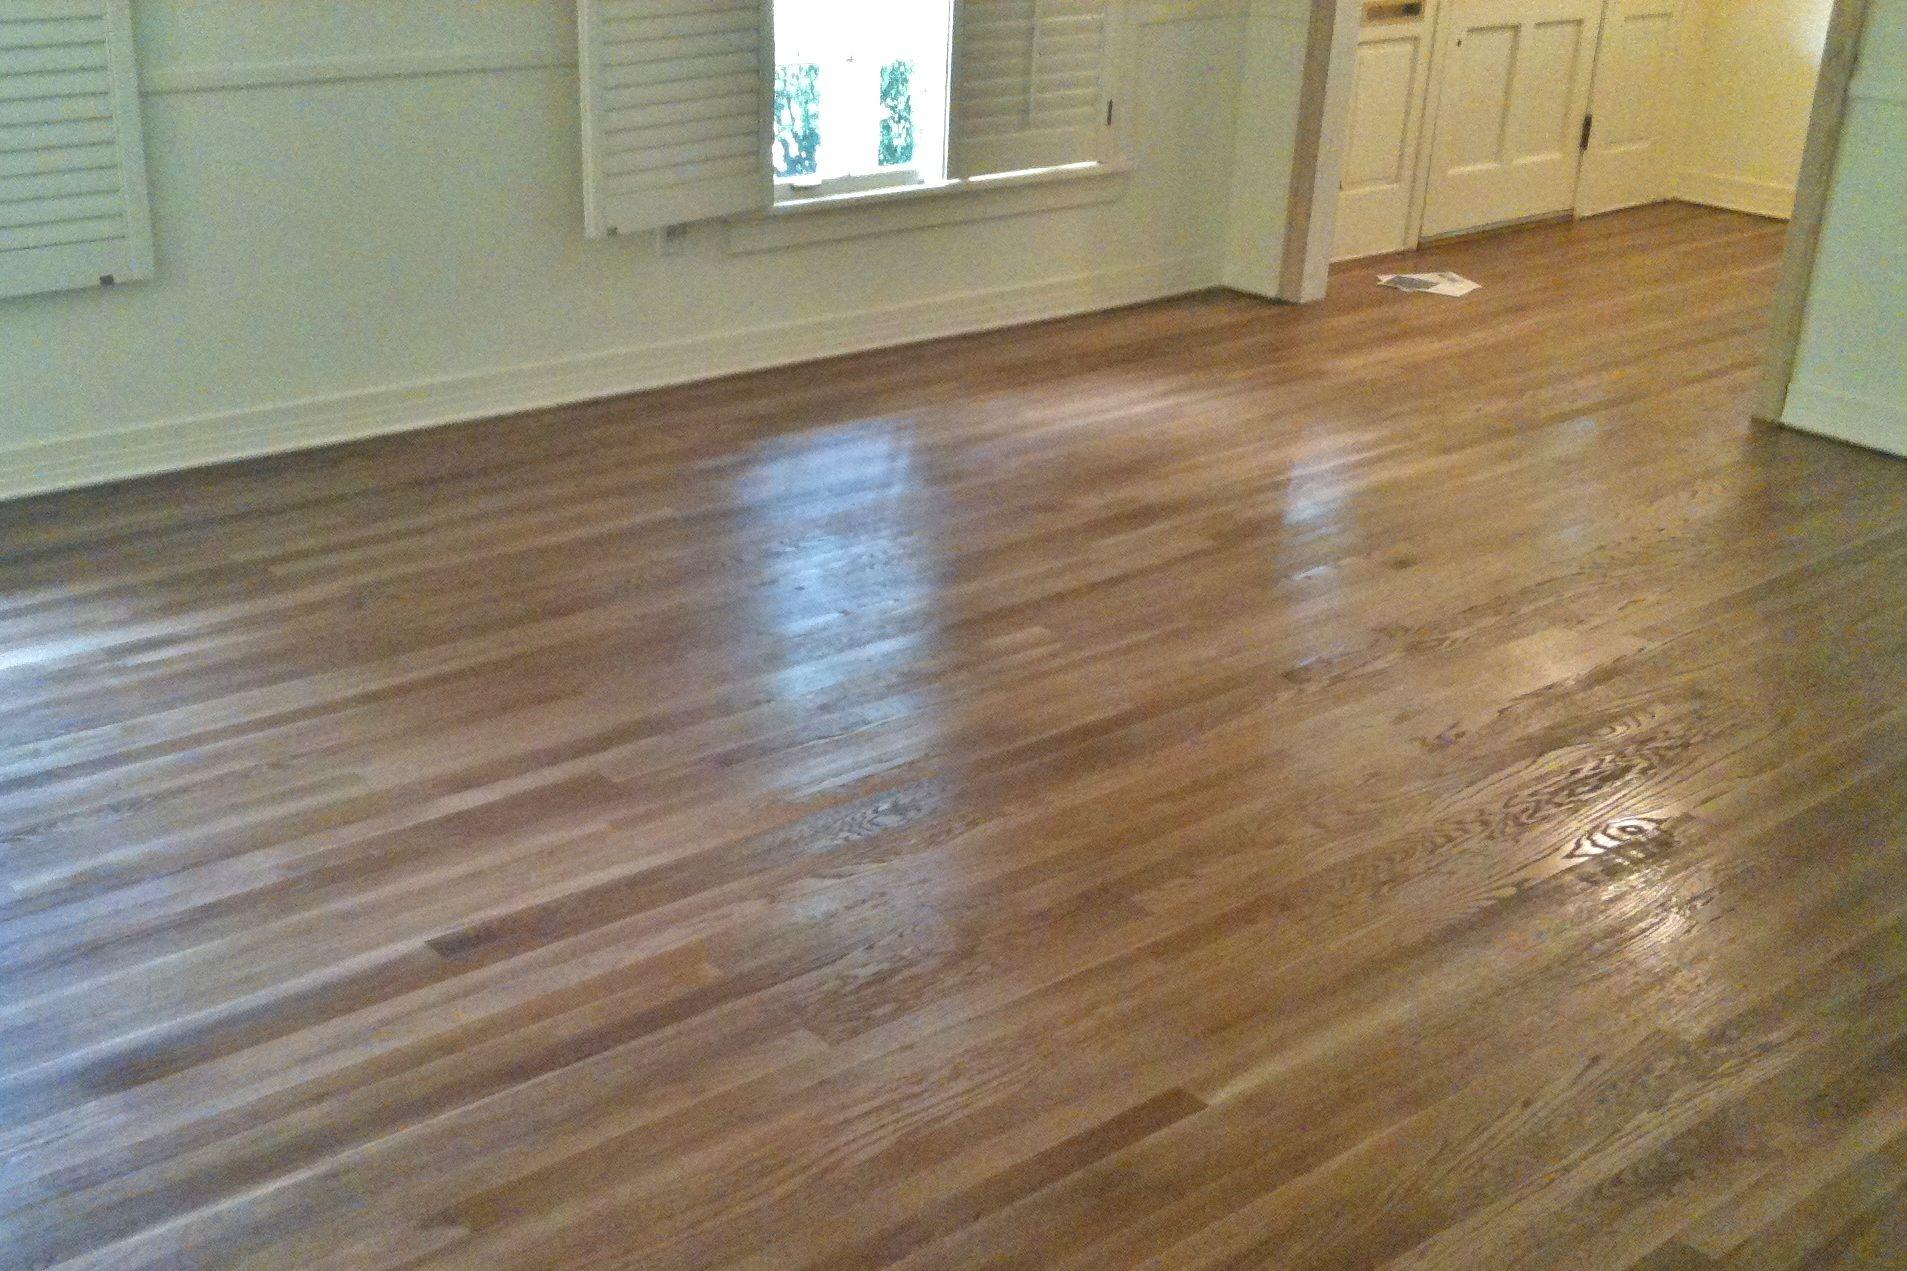 character grade walnut hardwood flooring of oak meet special walnut home design pinterest flooring with regard to minwax special walnut stain on oak hardwood floors